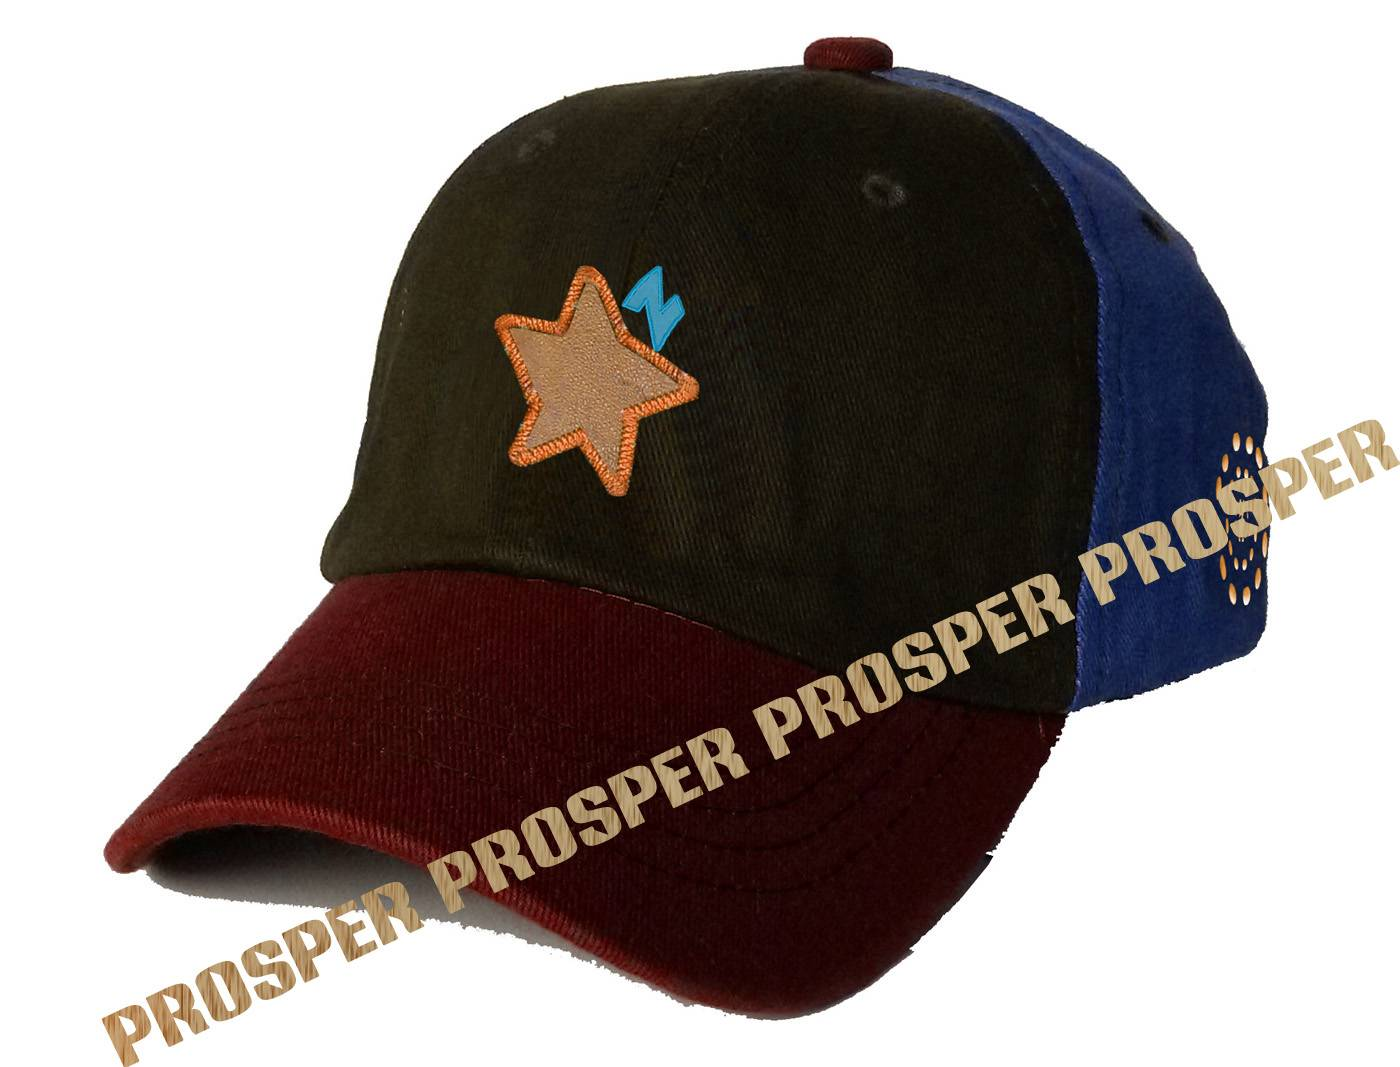 Kid cap,Children Cap,Baseball Cap,Cotton Cap,Hat